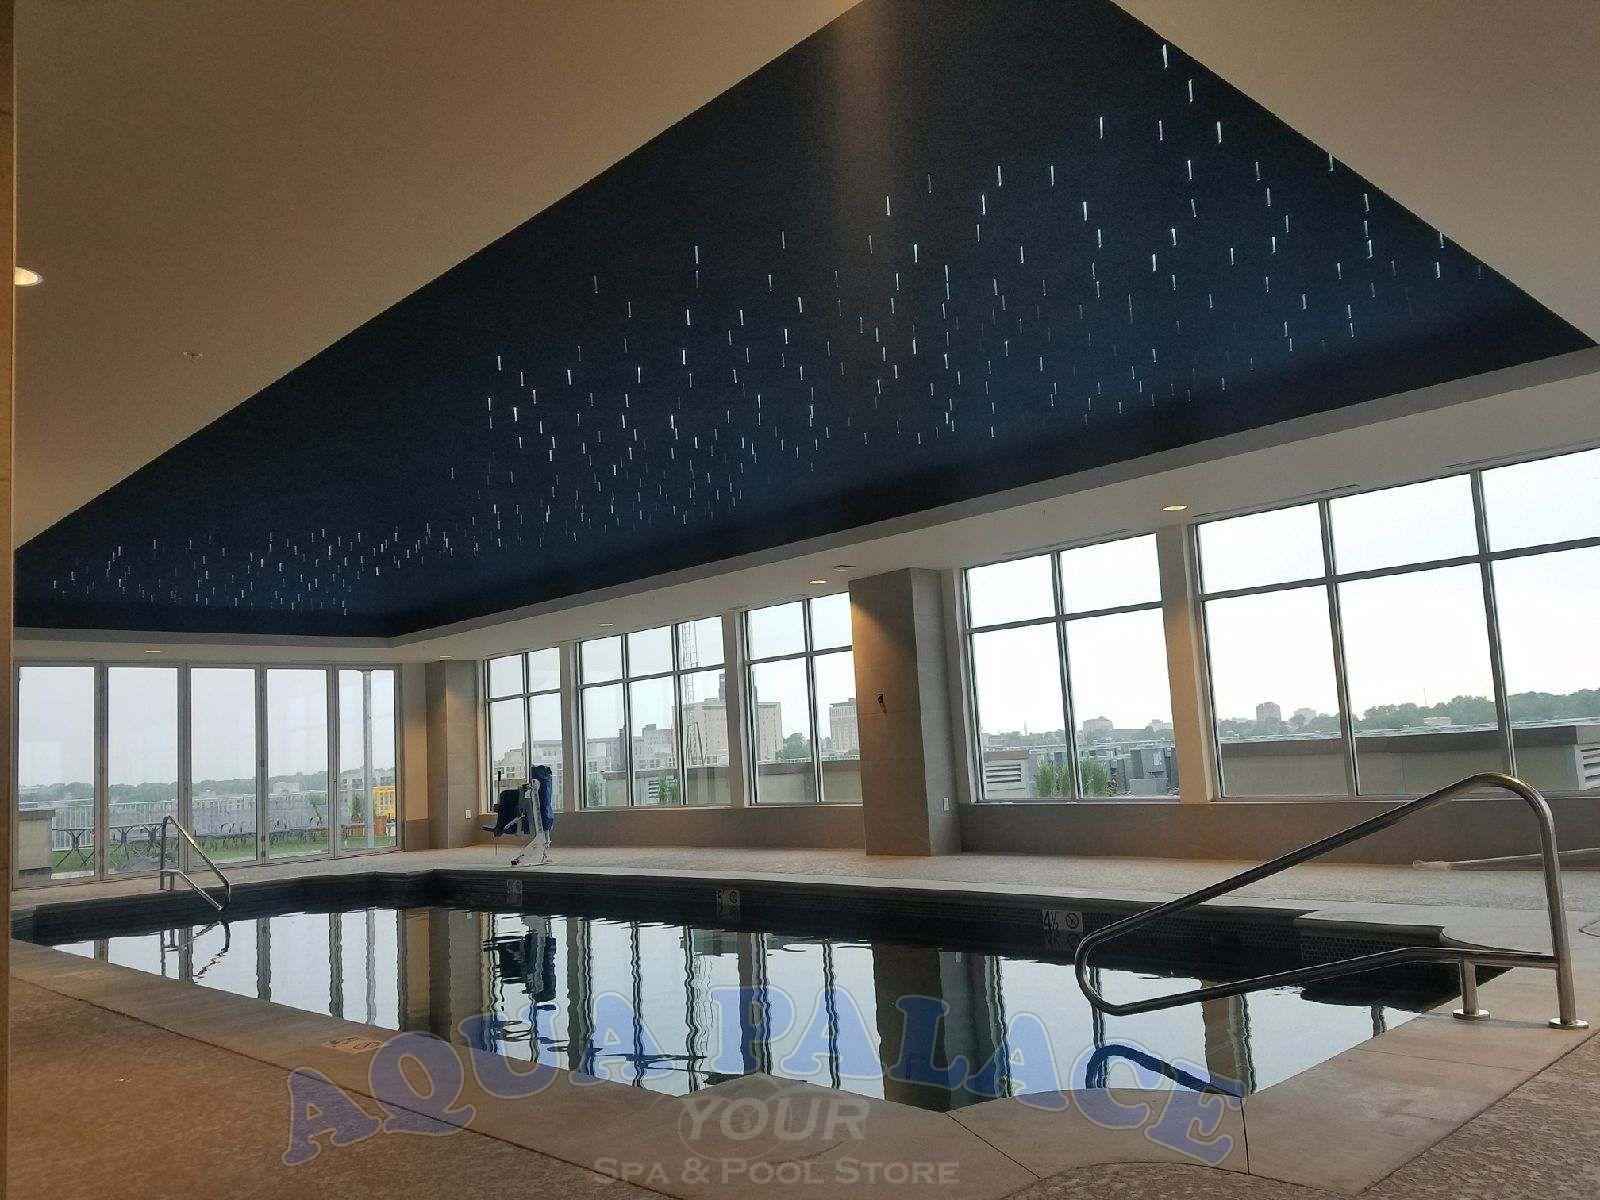 Atlas Apartments In Downtown Omaha Ne Fiberglass Pool On 8th Floor 16 X 44 Pool With Dual Staircases Custo Pool Designs Pool Builders Custom Pool Tables